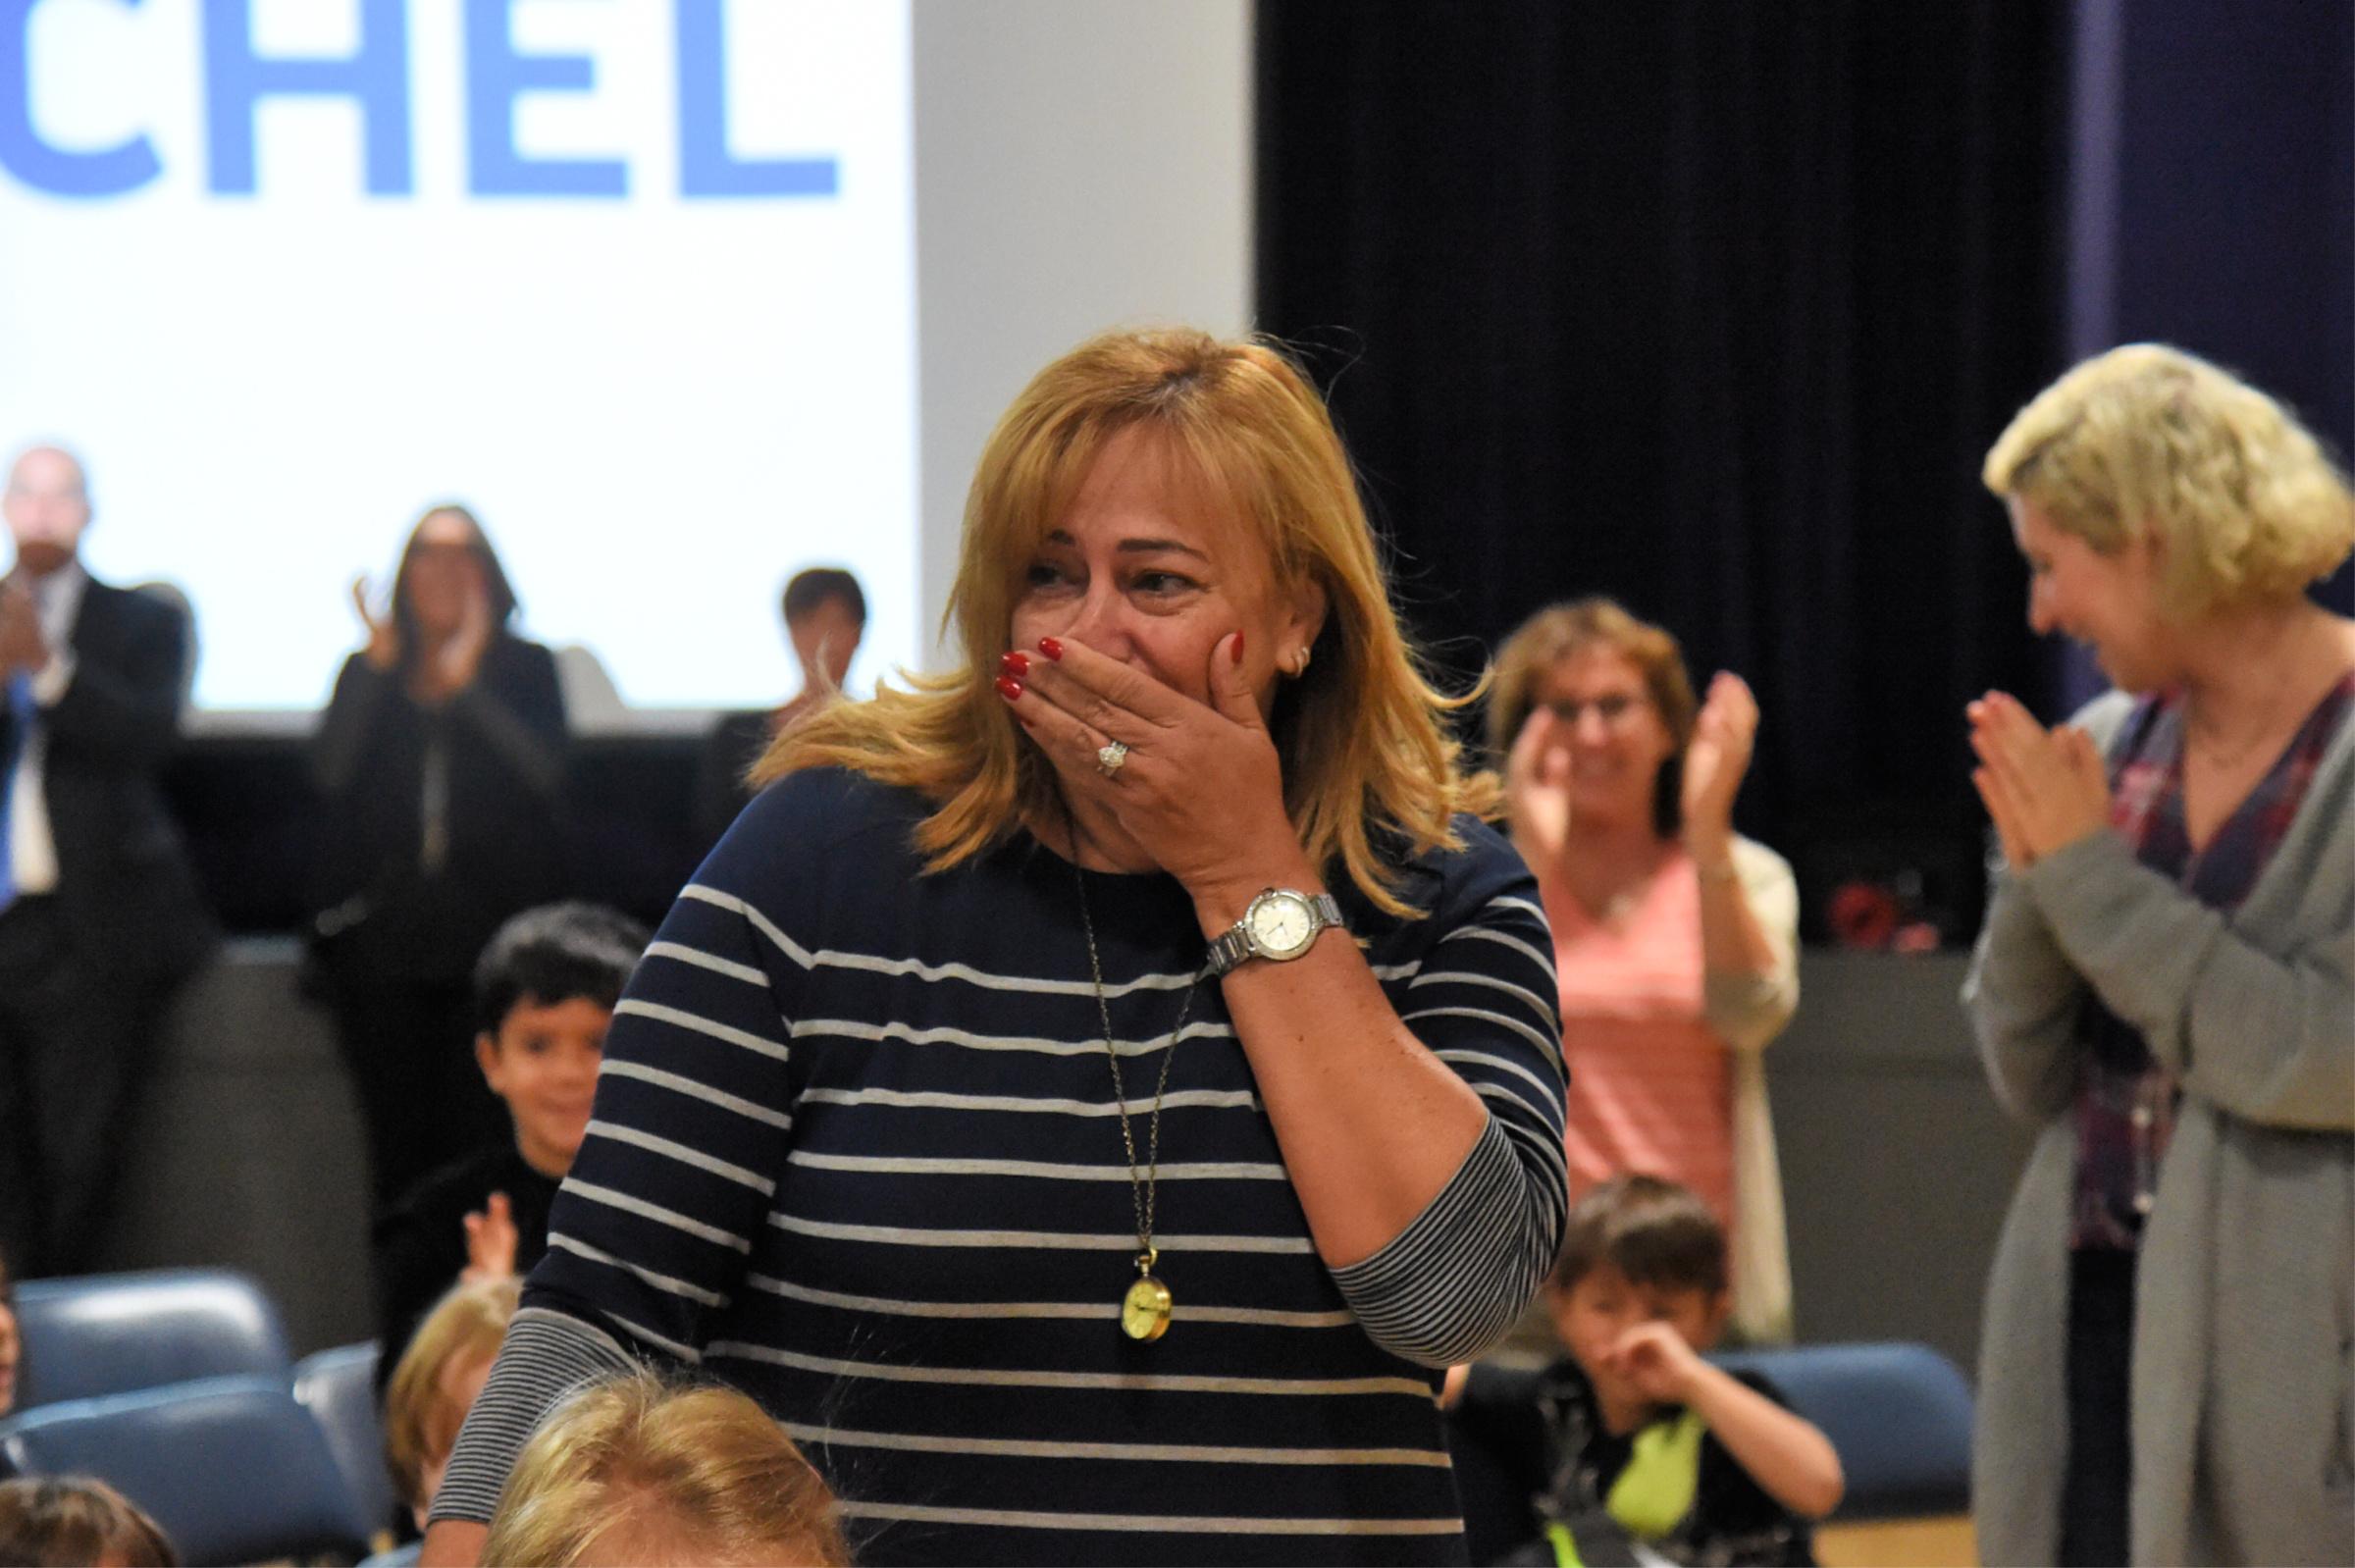 Fanny Koyman Notification Fanny Koyman, Heschel's lead Hebrew and Judaic studies teacher for transitional kindergarten and kindergarten, is shocked to hear the news: She is the recipient of a 2018 Jewish Educator Award!